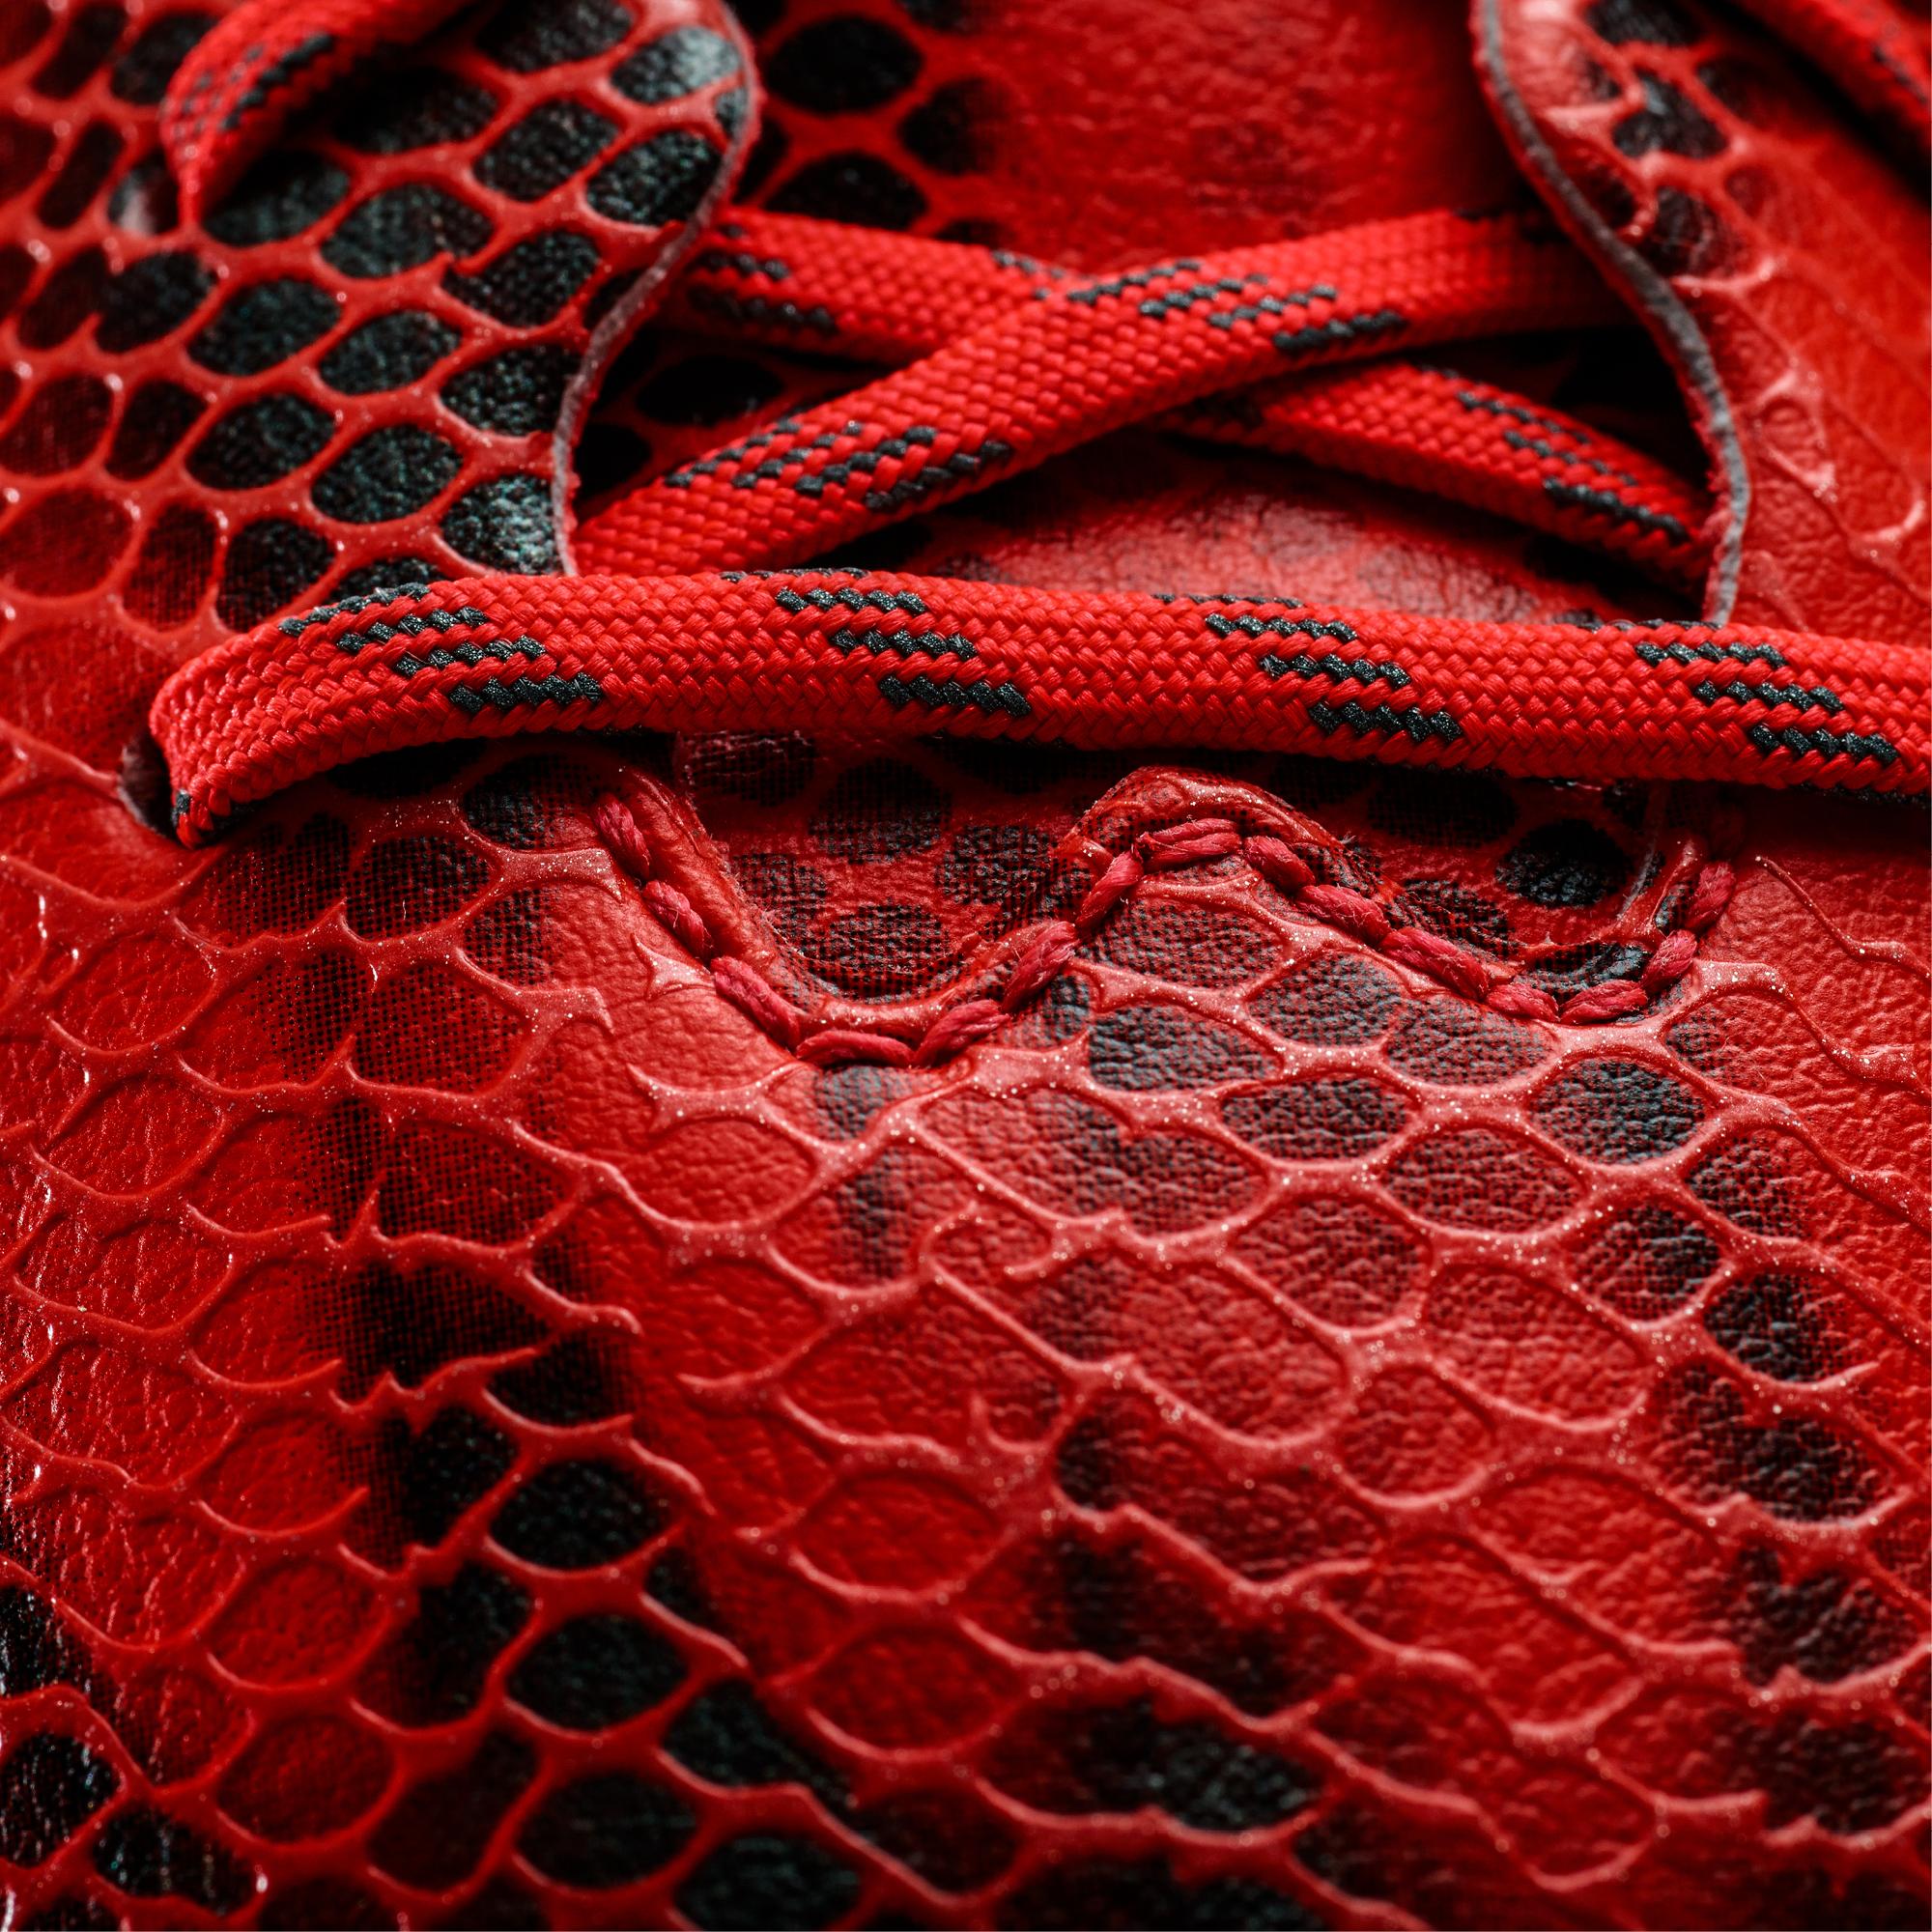 f50-adizero-snakeskin.jpg